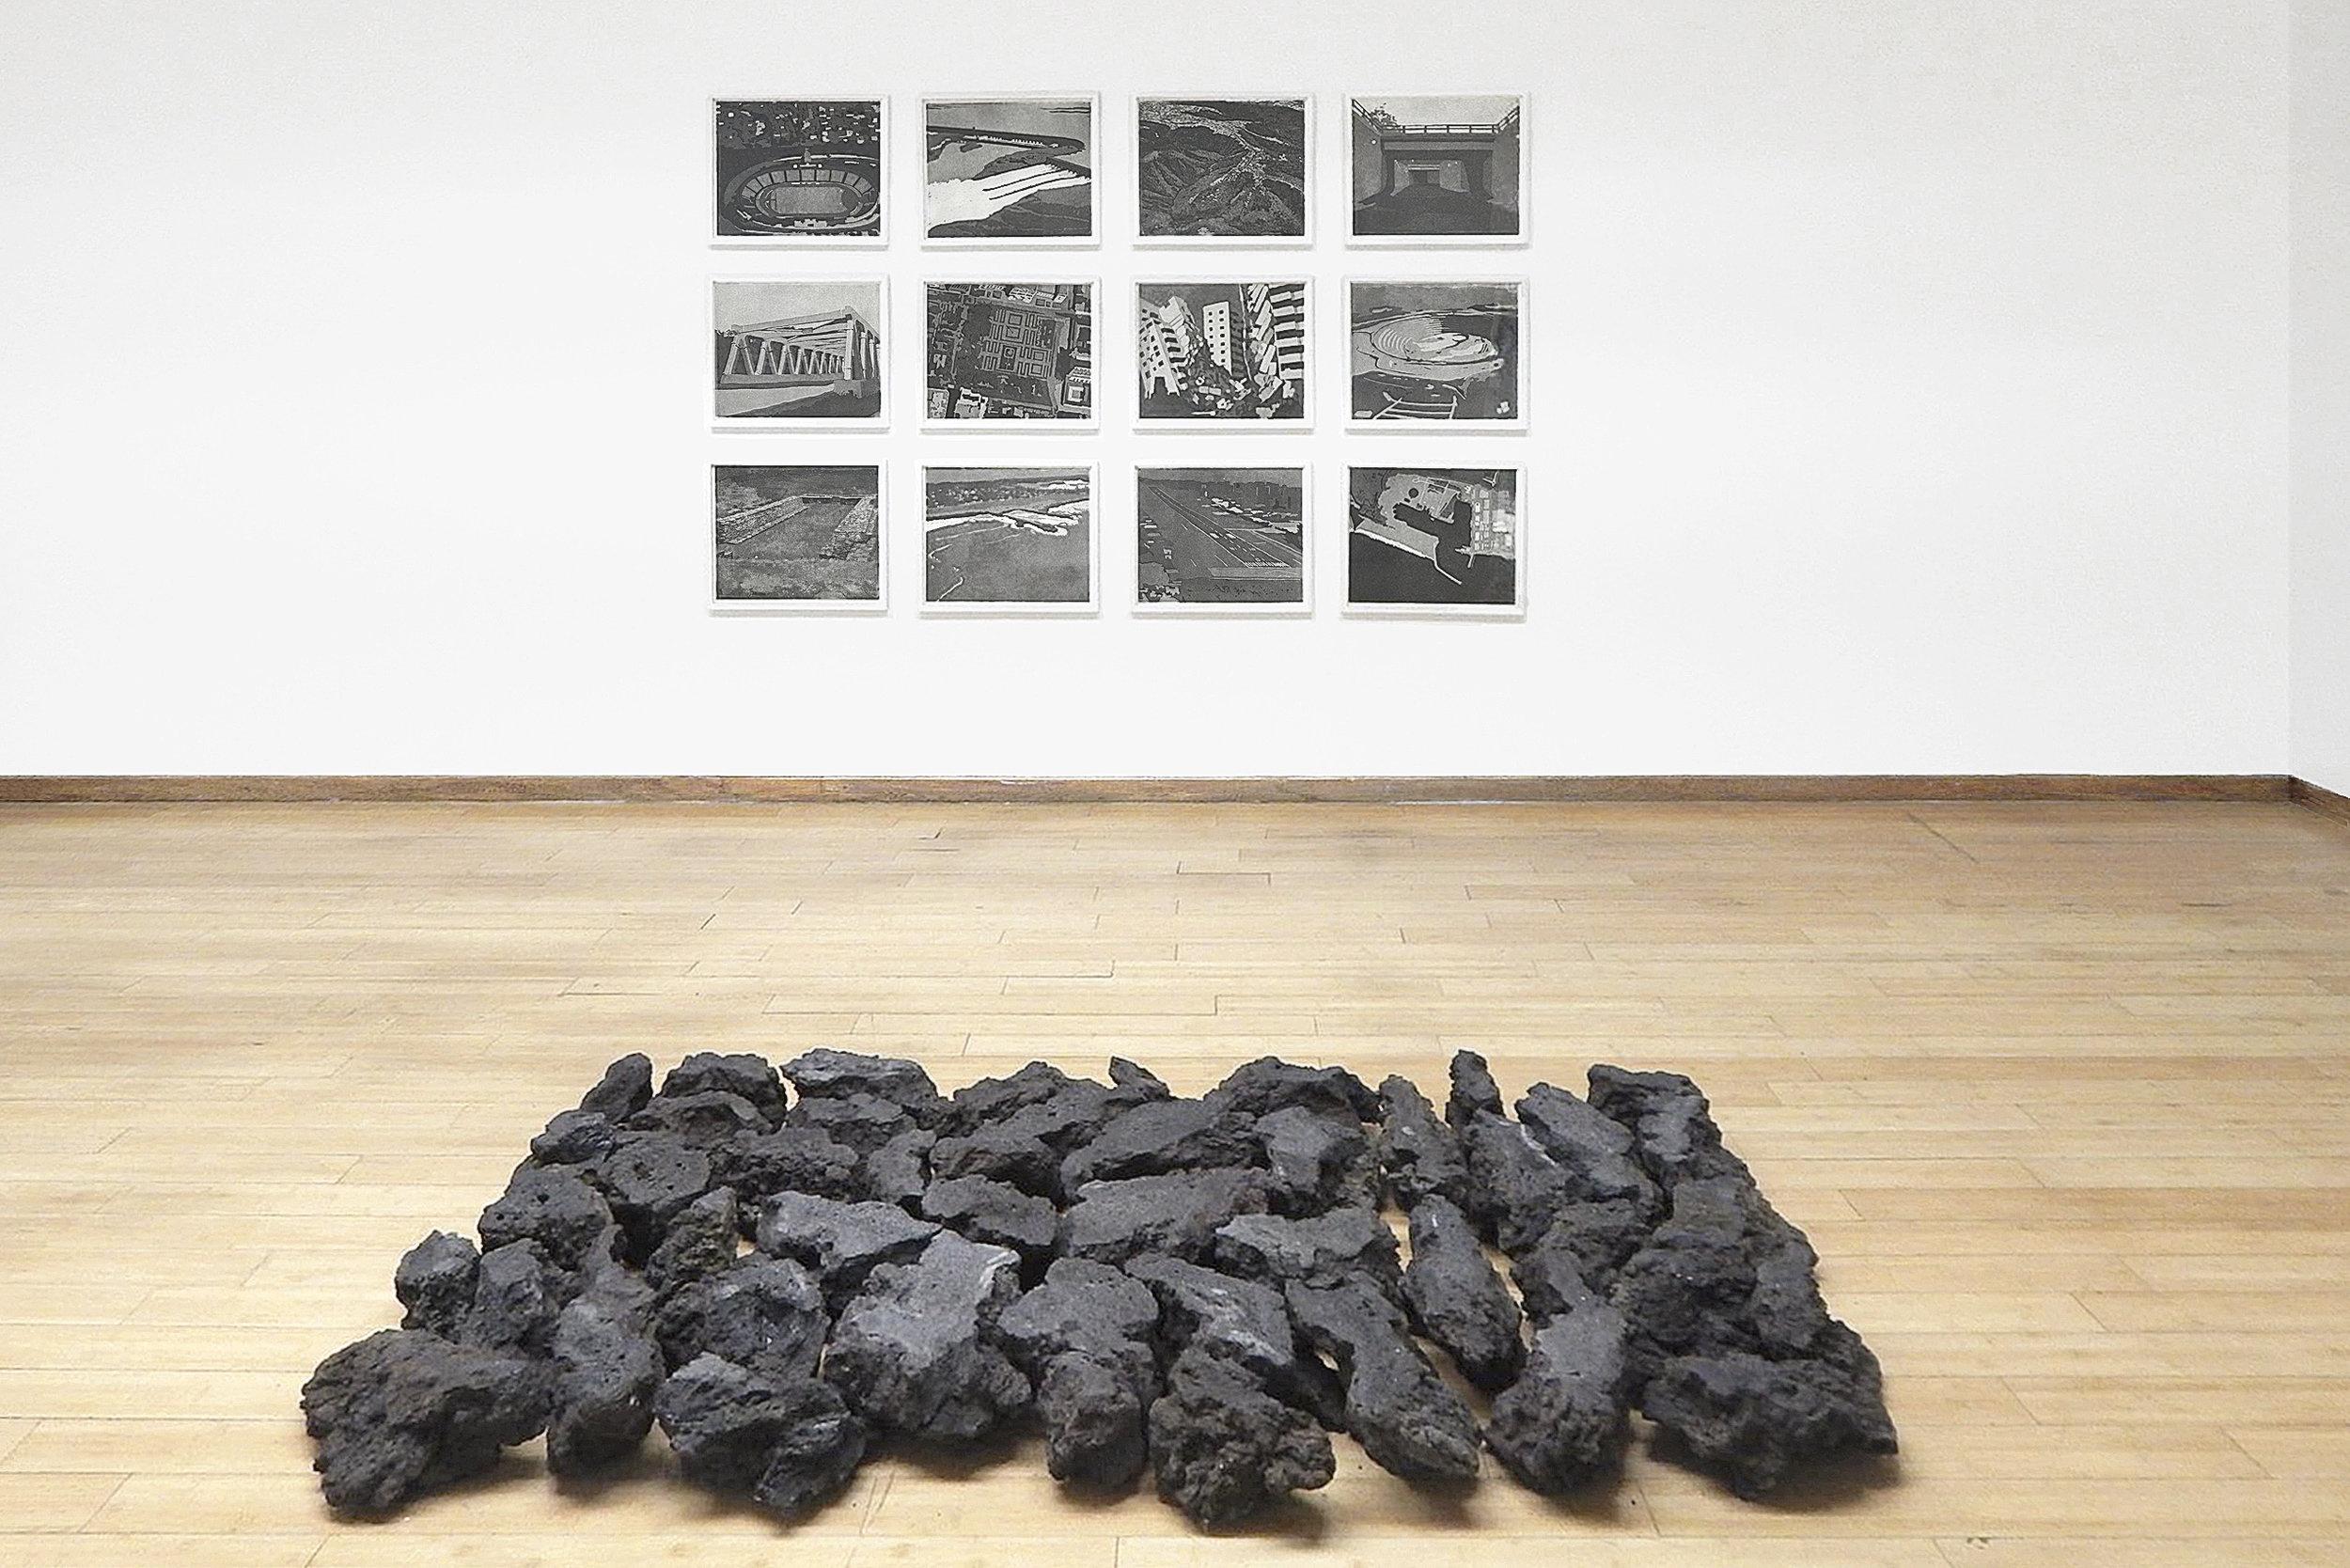 """Geografía"", impresiones giclée a partir de grabados al aguatinta, 244cm x 151cm | ""Superficie"", piedra volcánica intervenida, 244cm x 35cm x100cm | 2016"